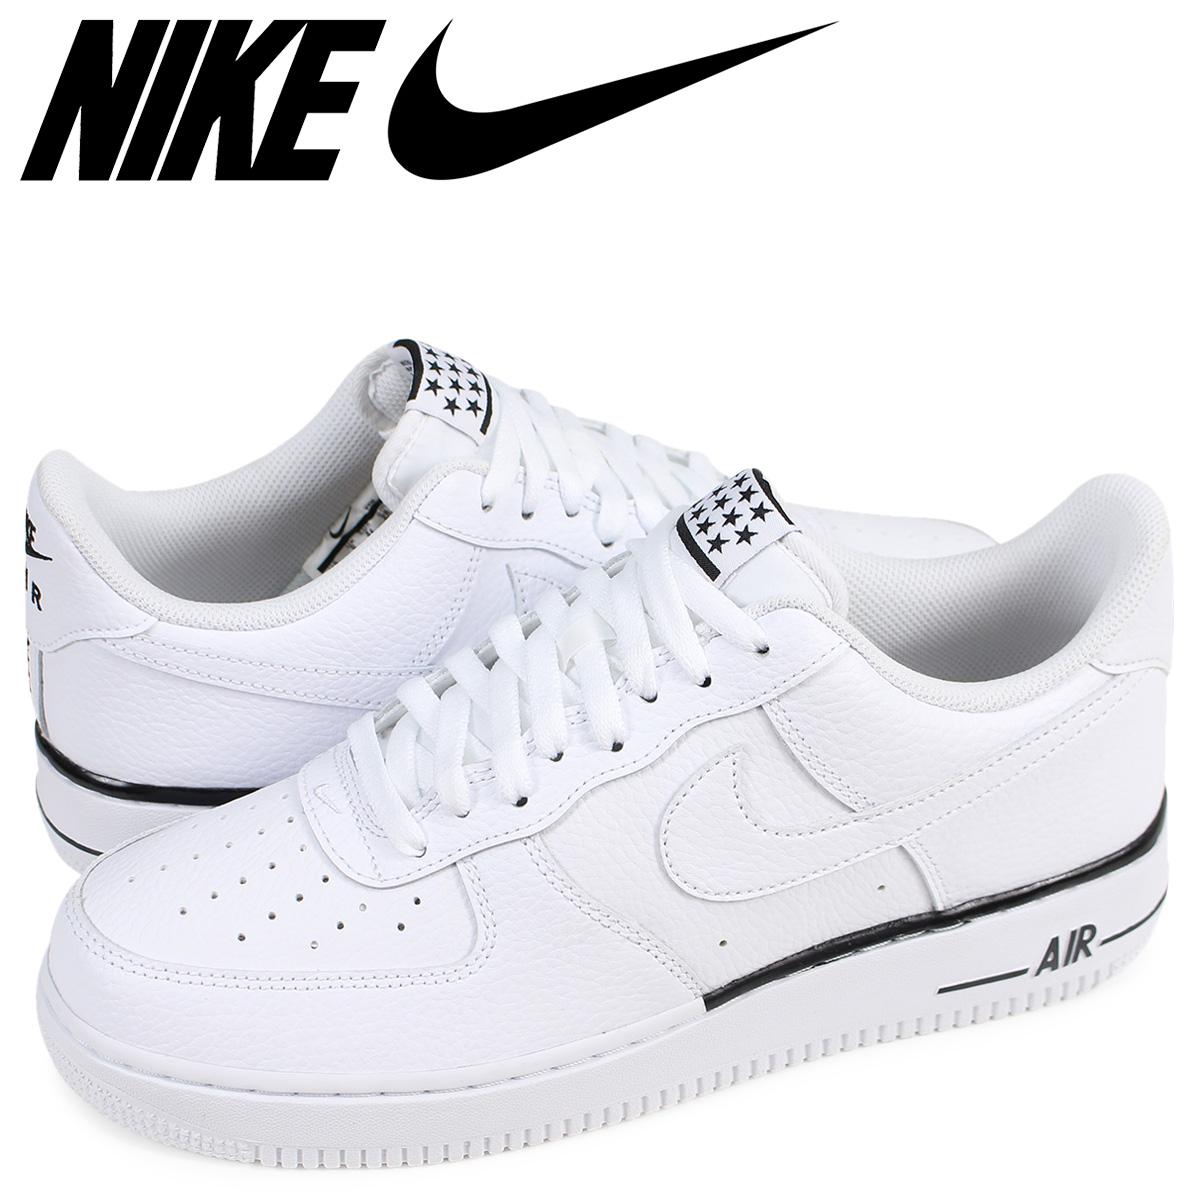 33fe4be9f74 Sugar Online Shop  NIKE Nike air force 1 07 sneakers men AIR FORCE 1 ...